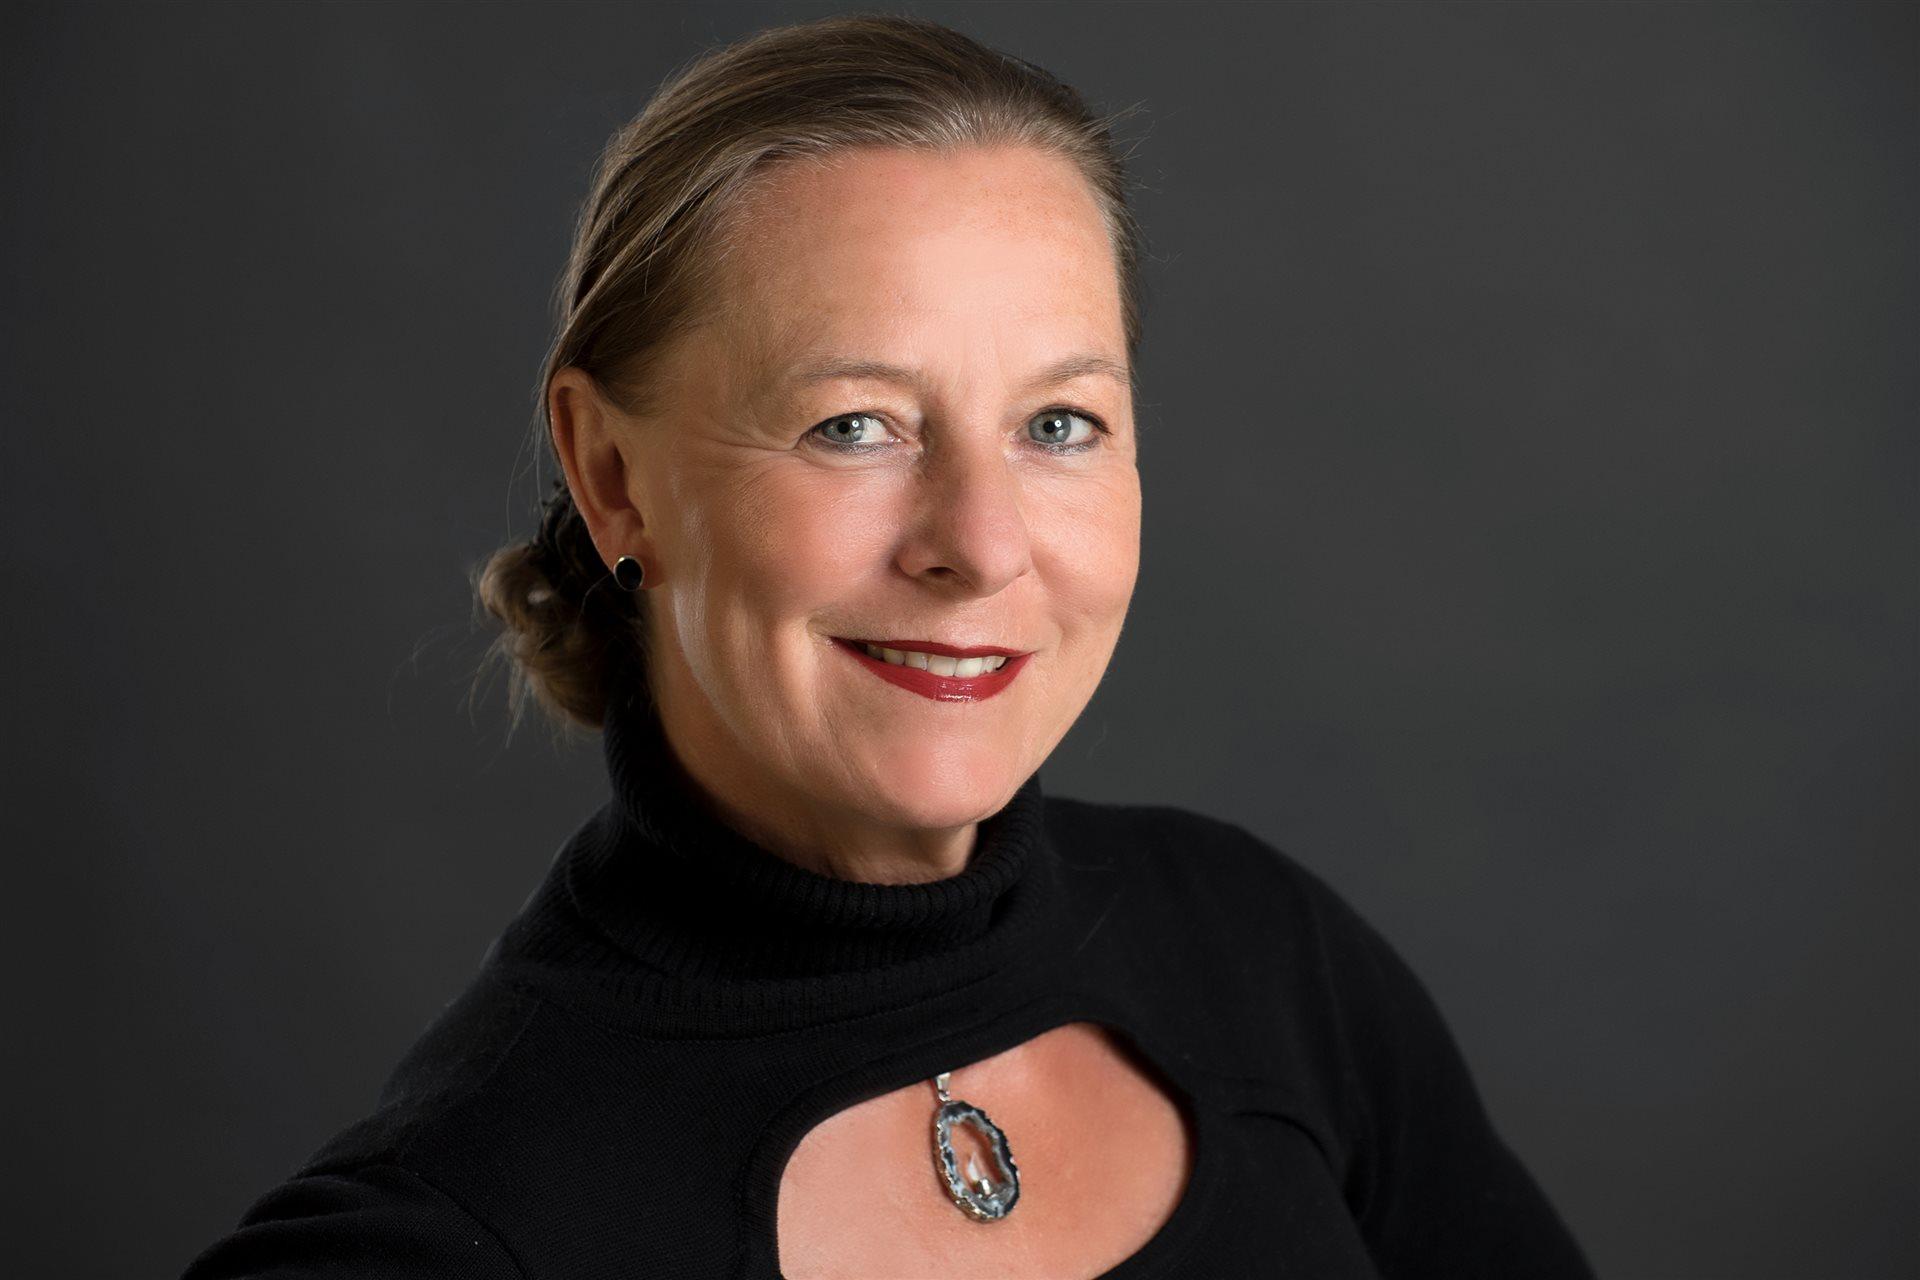 Antje Kahn